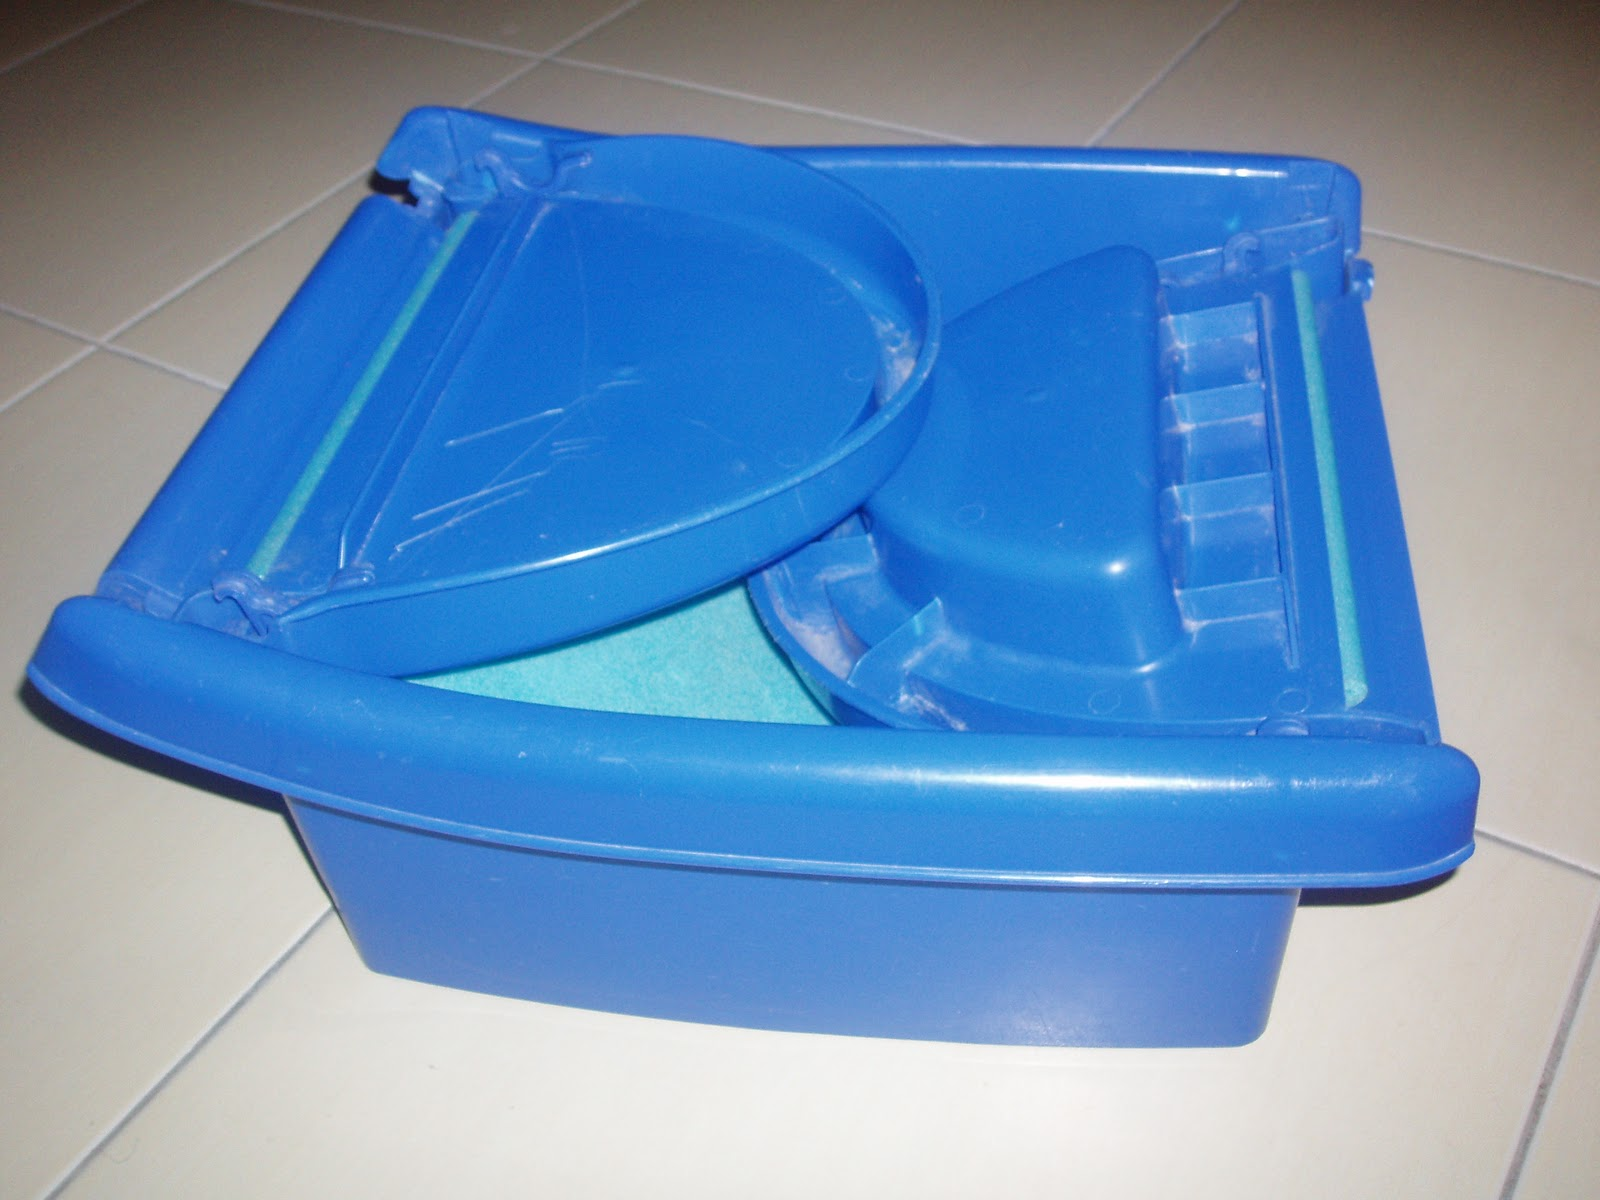 myjunkmyprecious safety first baby bath tub. Black Bedroom Furniture Sets. Home Design Ideas